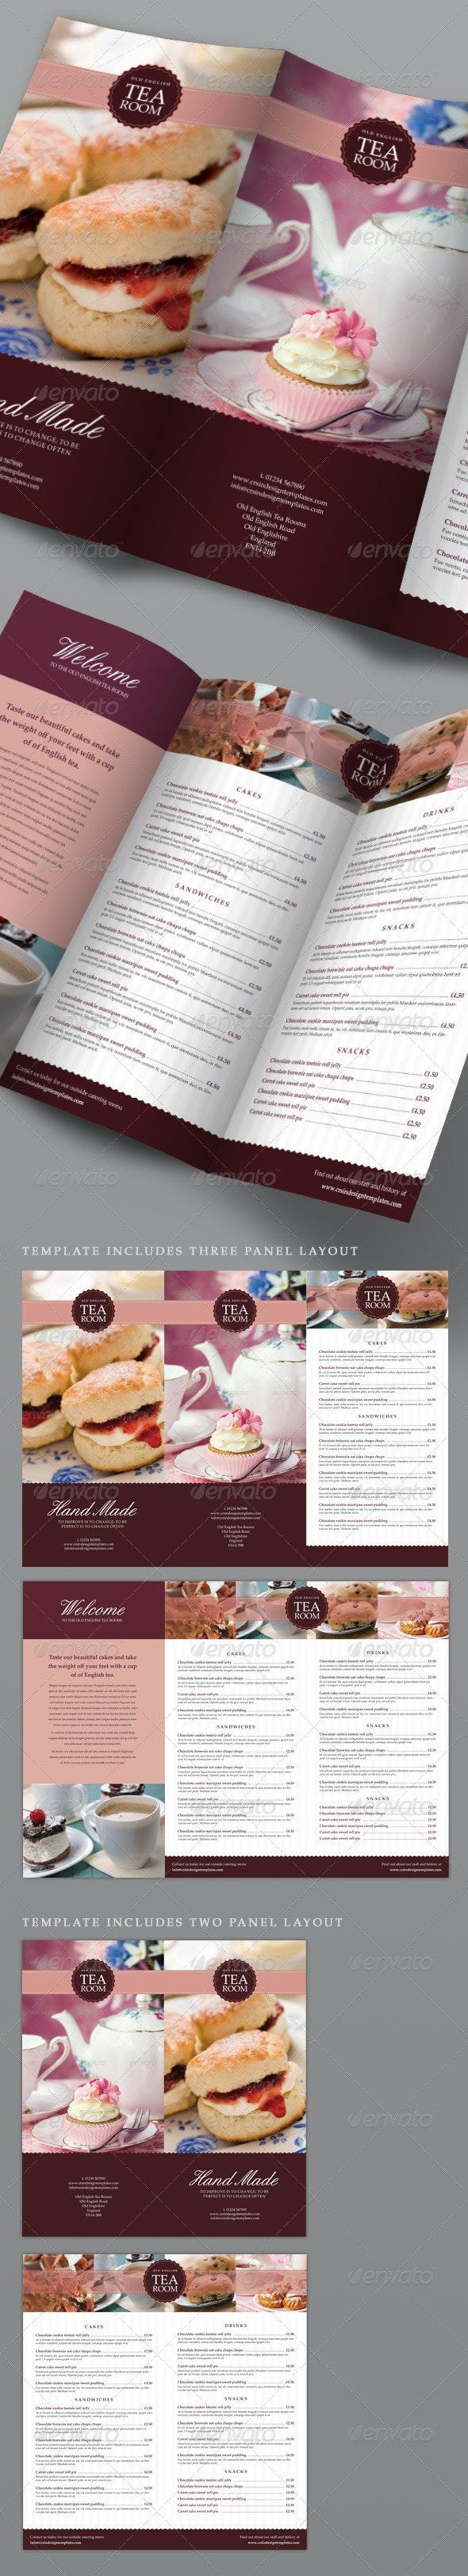 Tea Room Coffee Shop Menu - Food Menus Print Templates